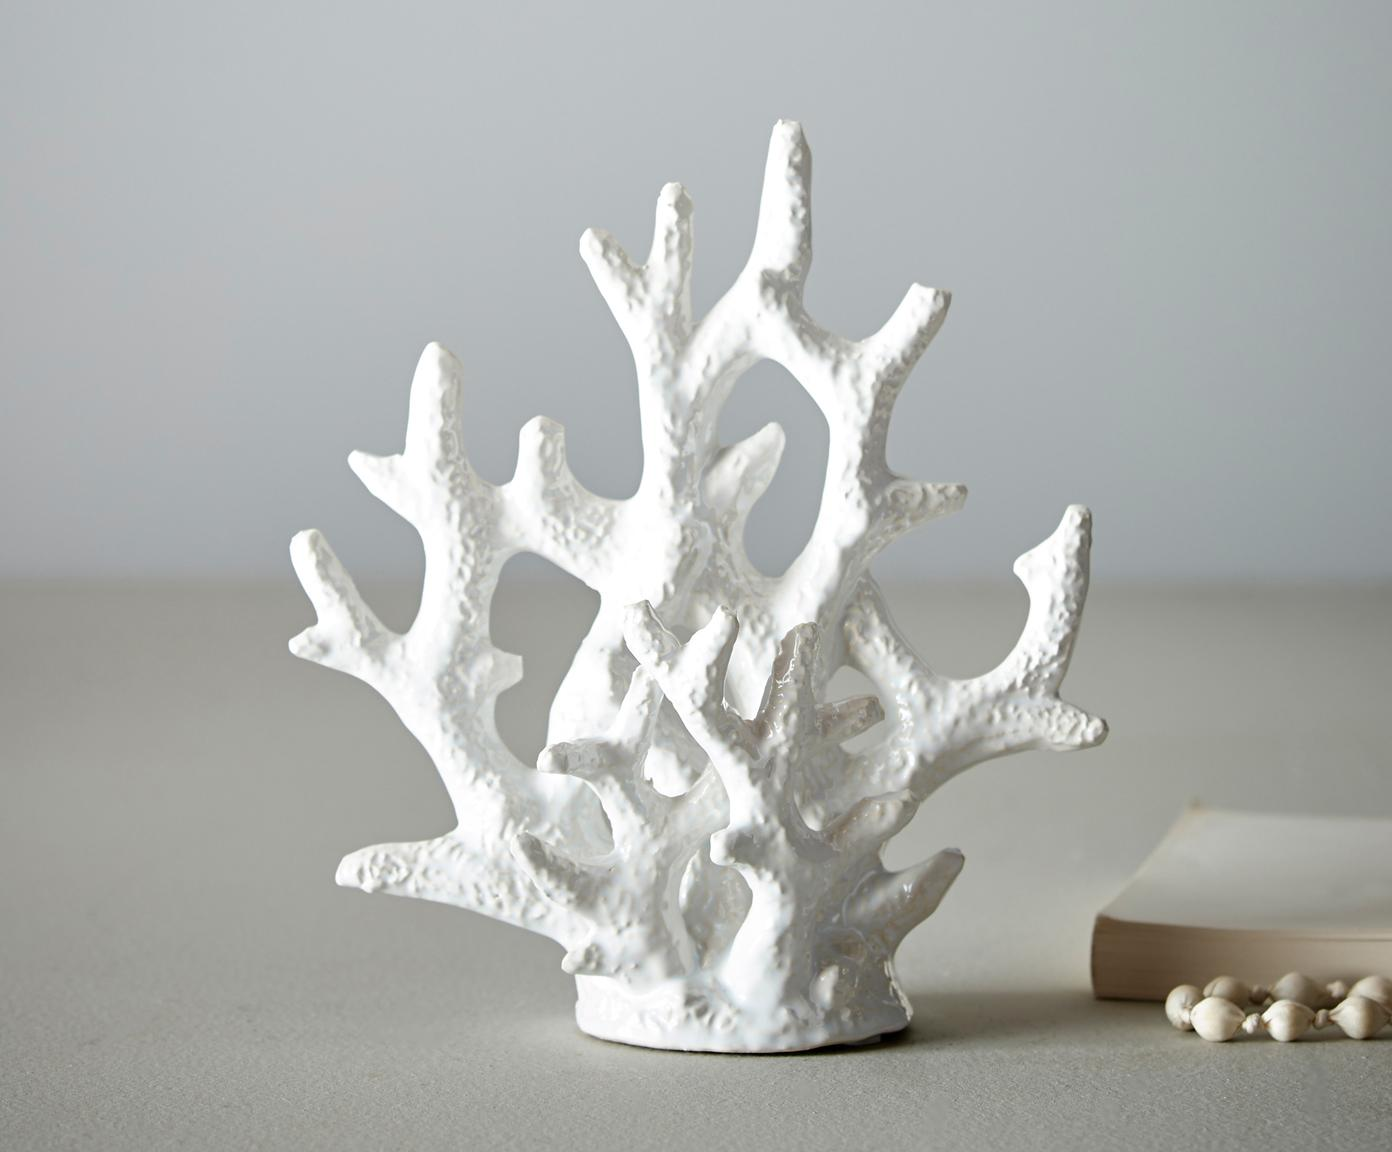 Handgefertigtes Deko-Objekt Corallo, Keramik, glasiert, Weiß, 21 x 22 cm